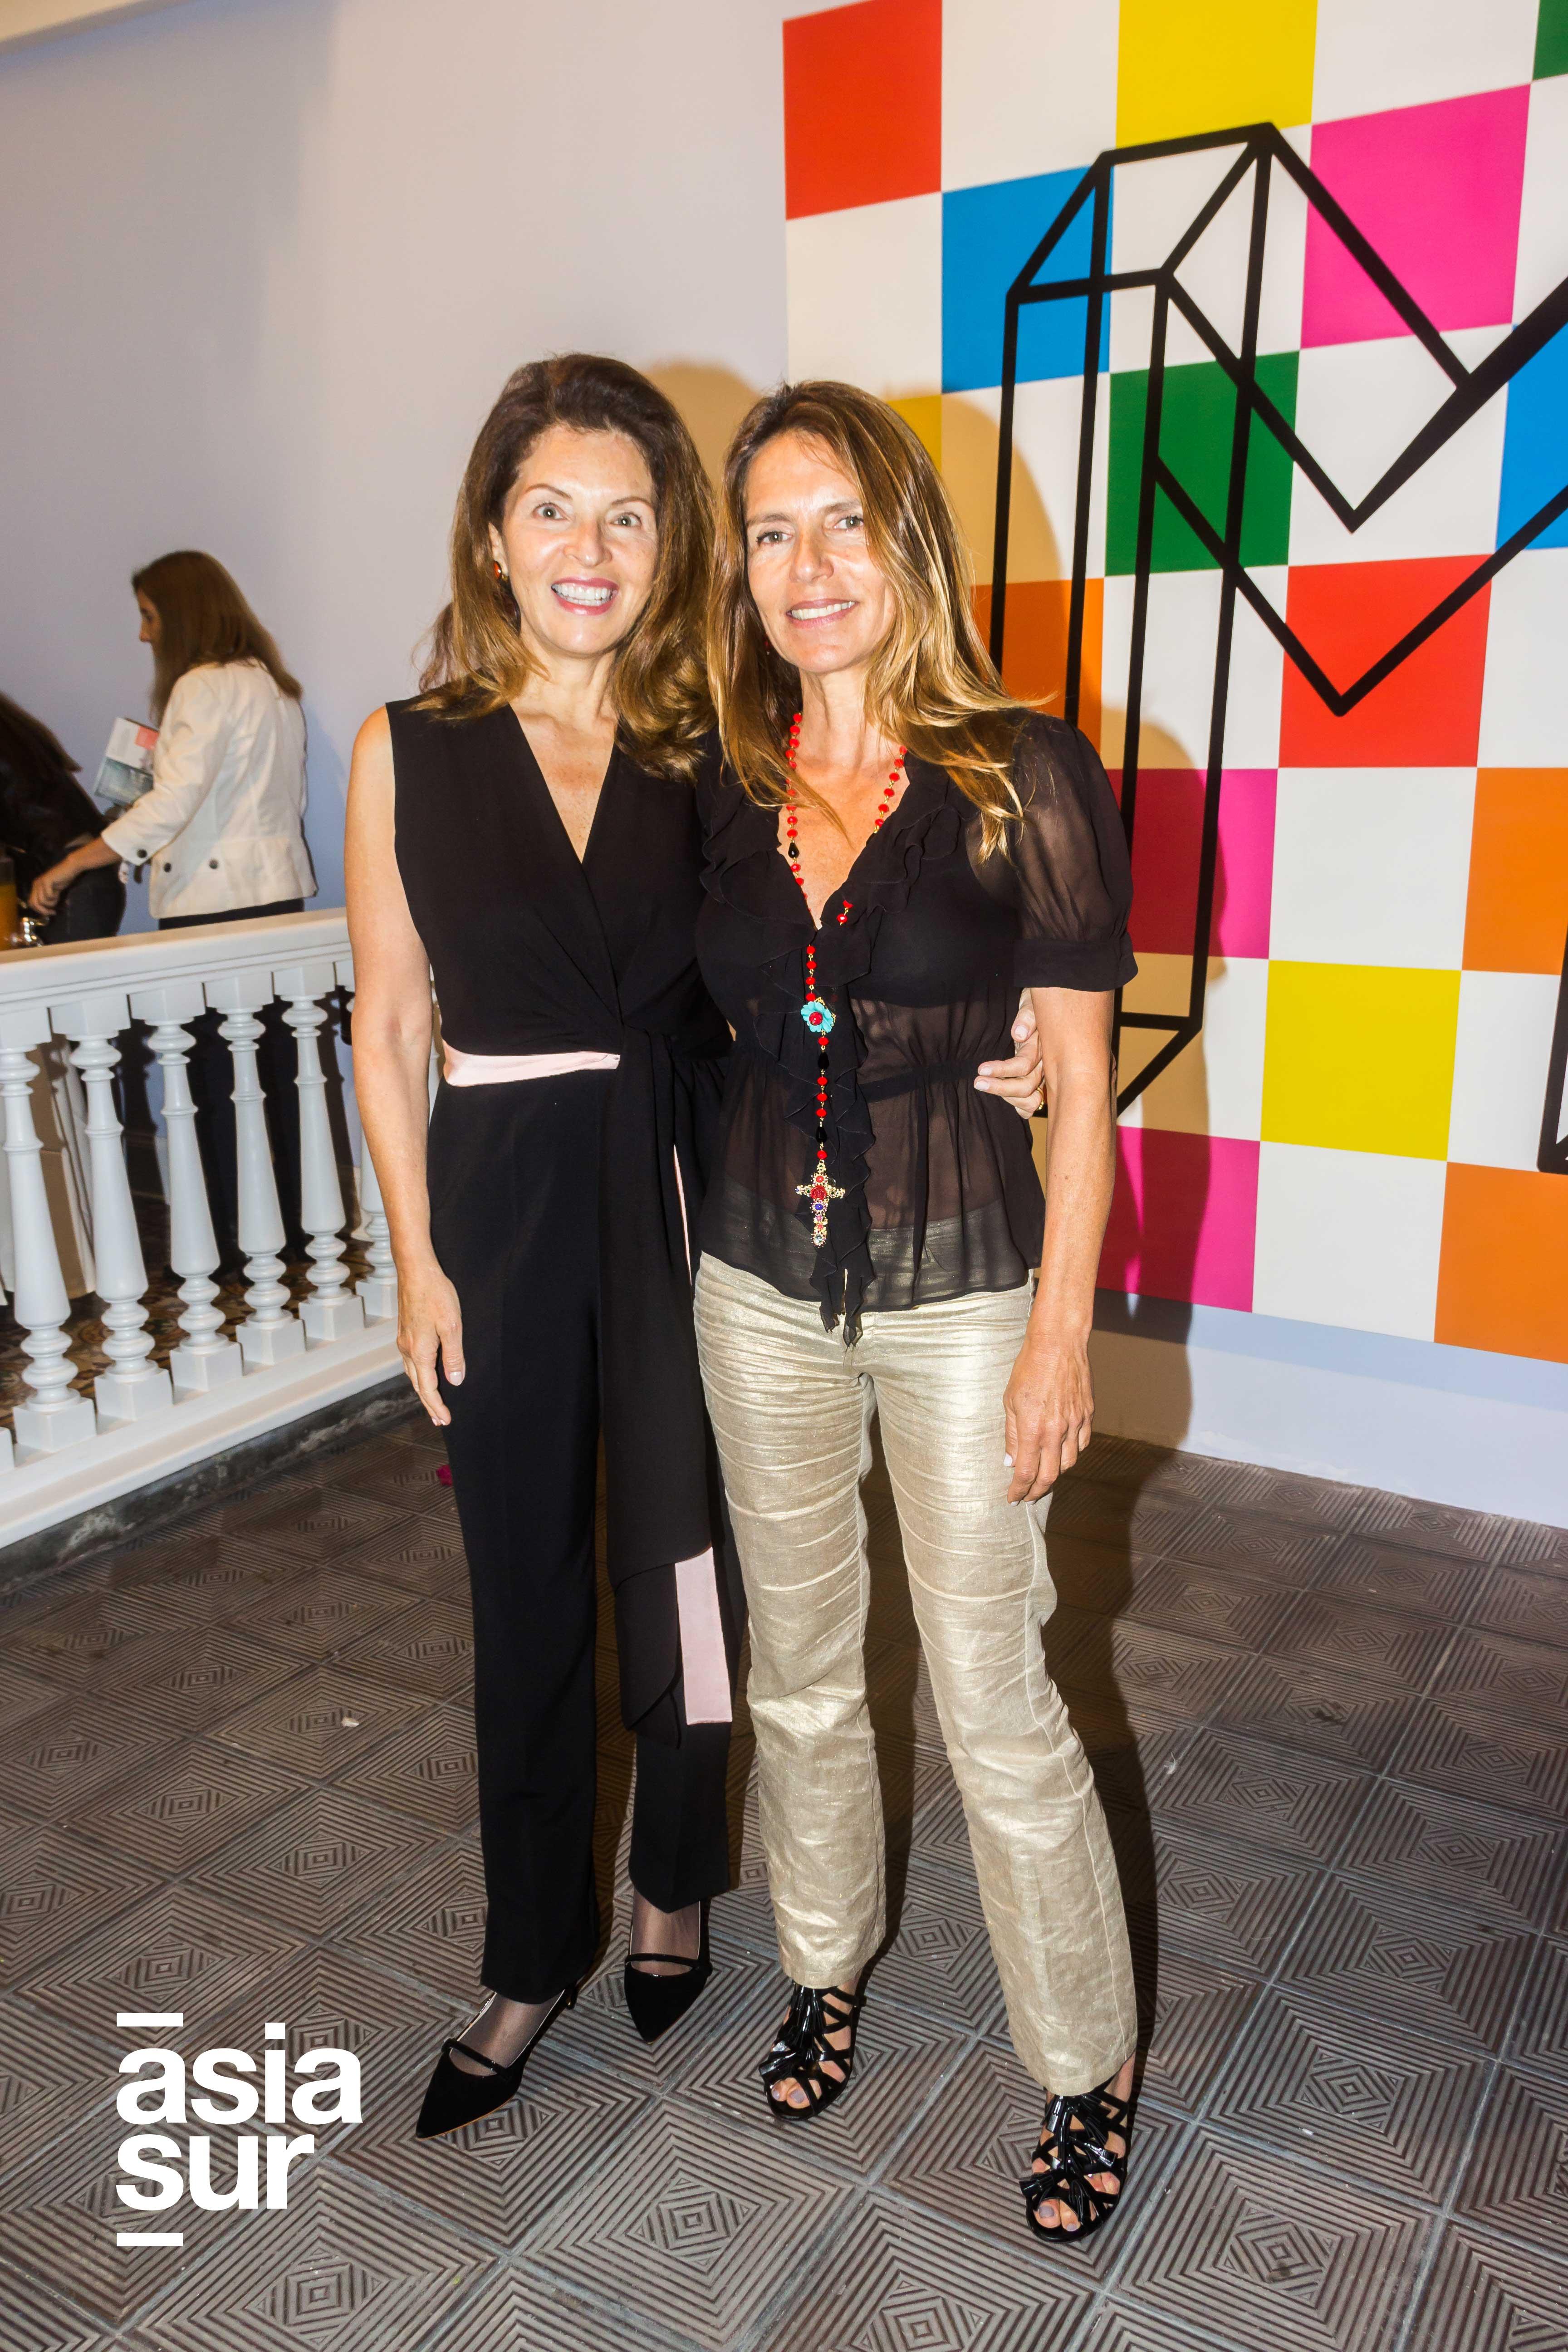 Marcela Ganoza y Muse Indacochea